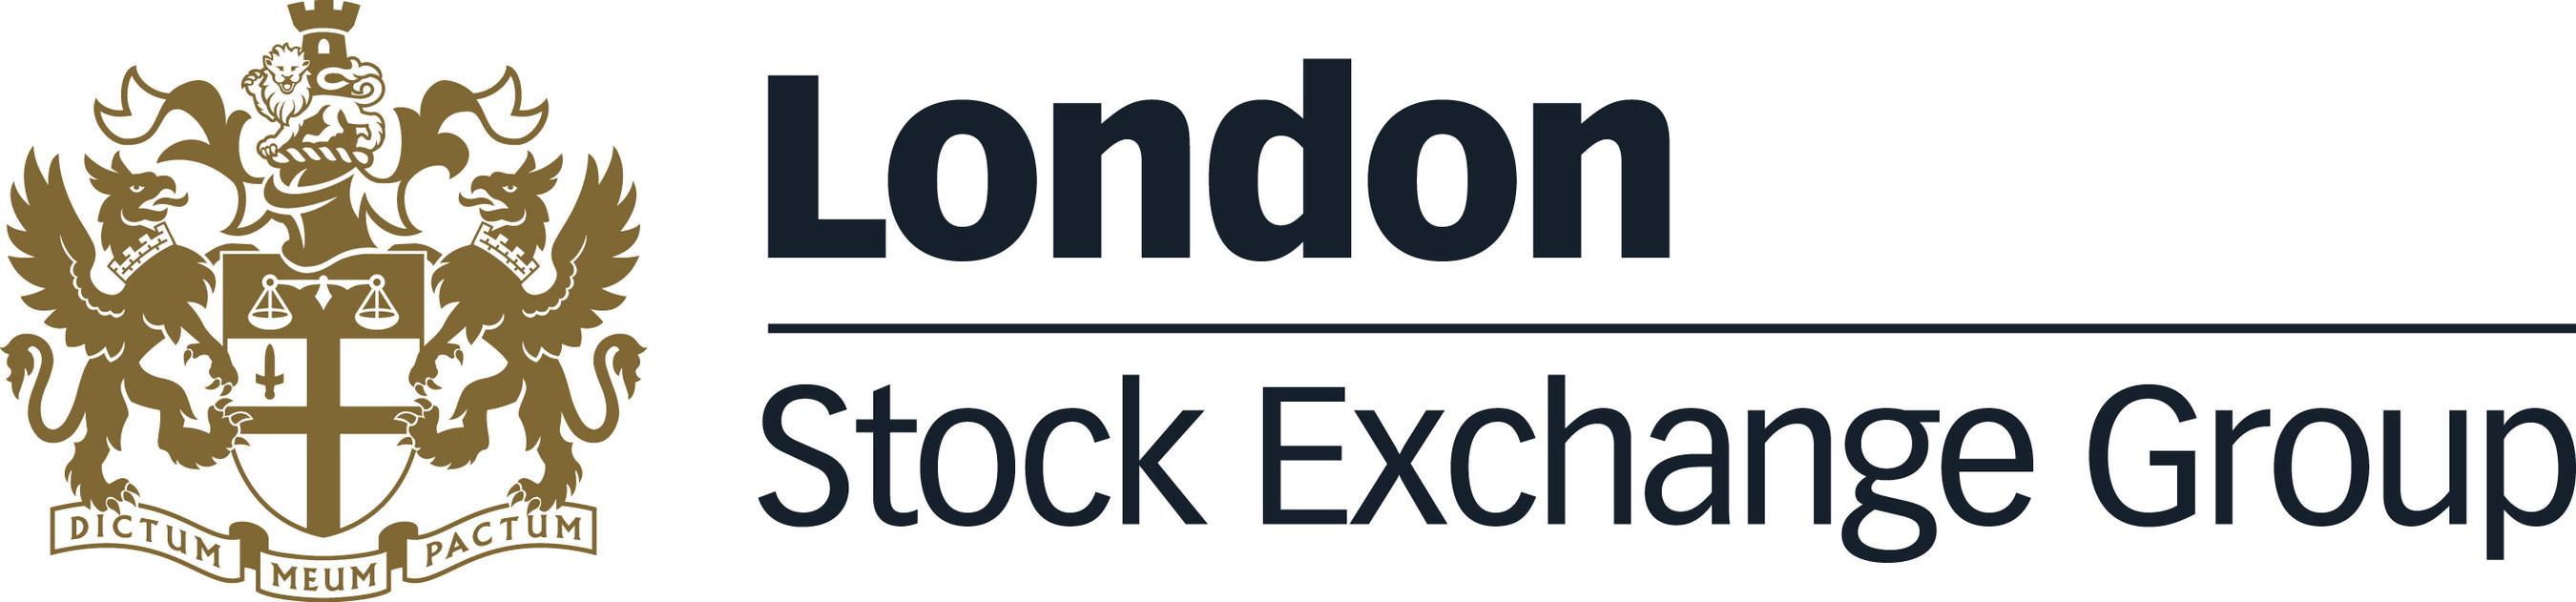 London Stock Exchange Group